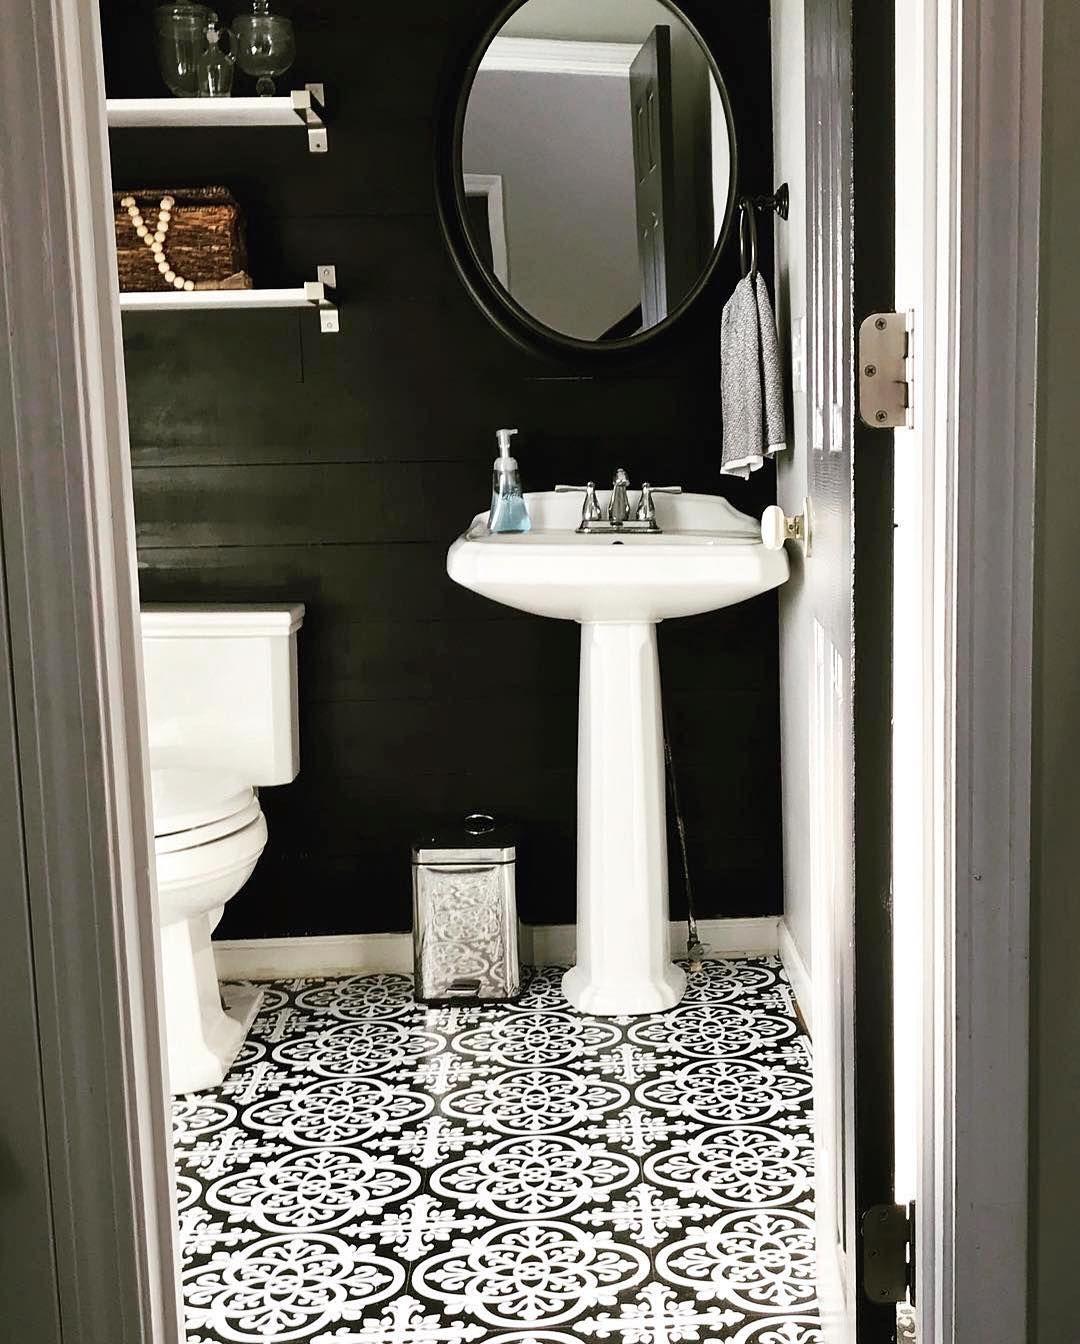 Floorpops Peel And Stick Floor Tiles In A Powder Room Bathroom Makeover With Black Shiplap Peel And Stick Floor Master Bathroom Refresh Classic Bathroom Design